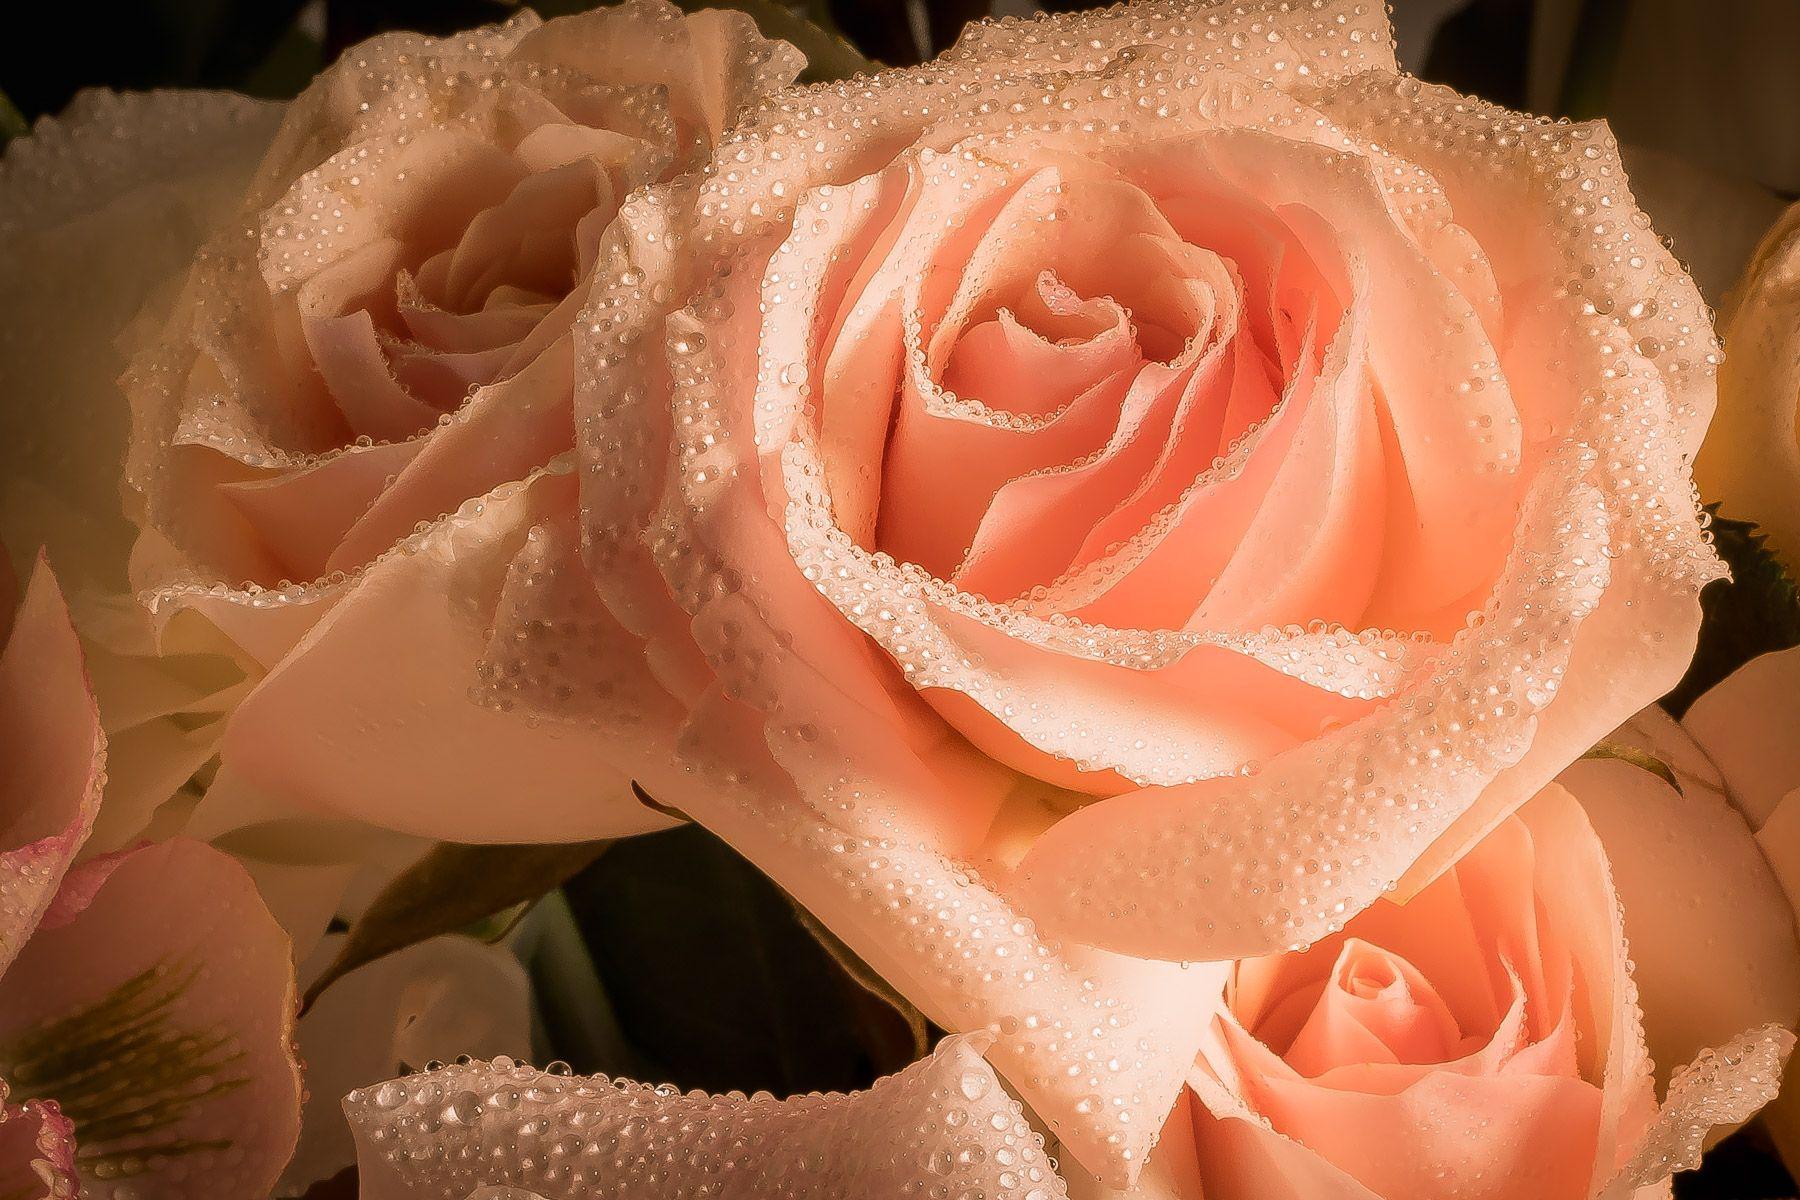 A Valentine's Rose